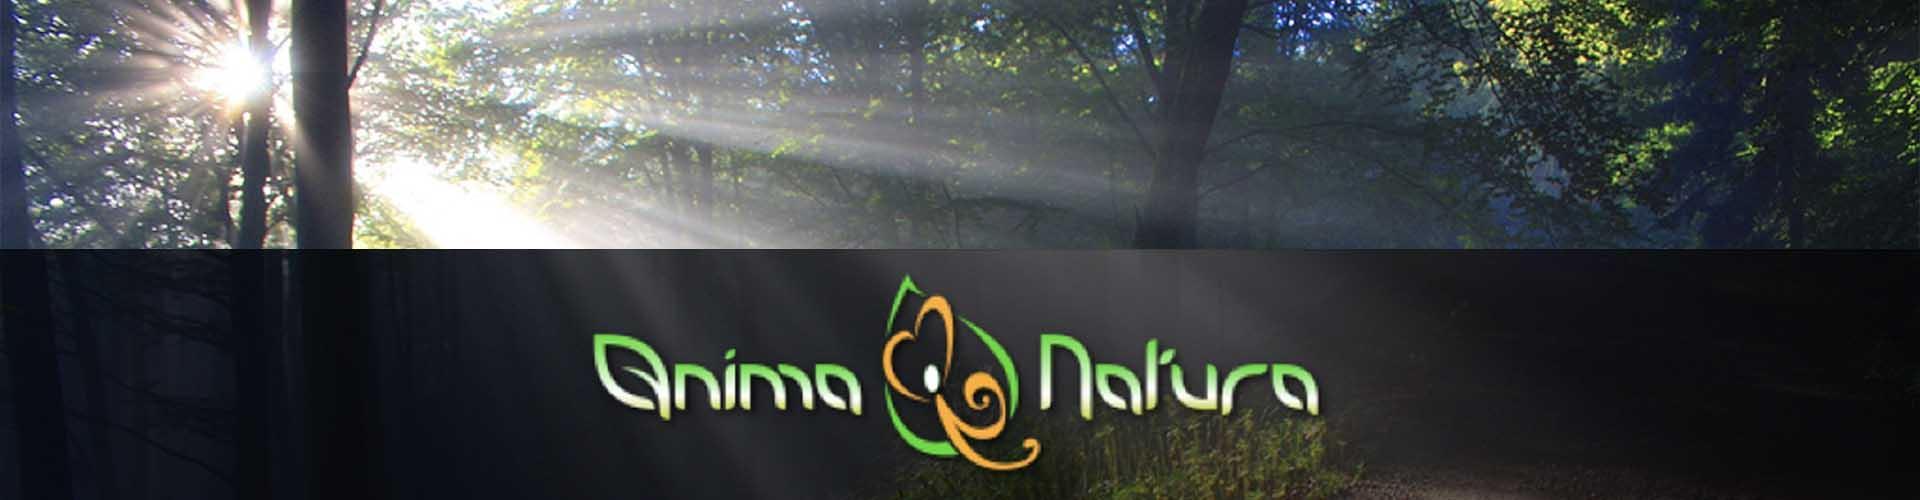 Seminario Anima Natura relatore Germano Caroli presso B&B & Meditation Center Zorba Il Buddha Passerano Marmorito Asti